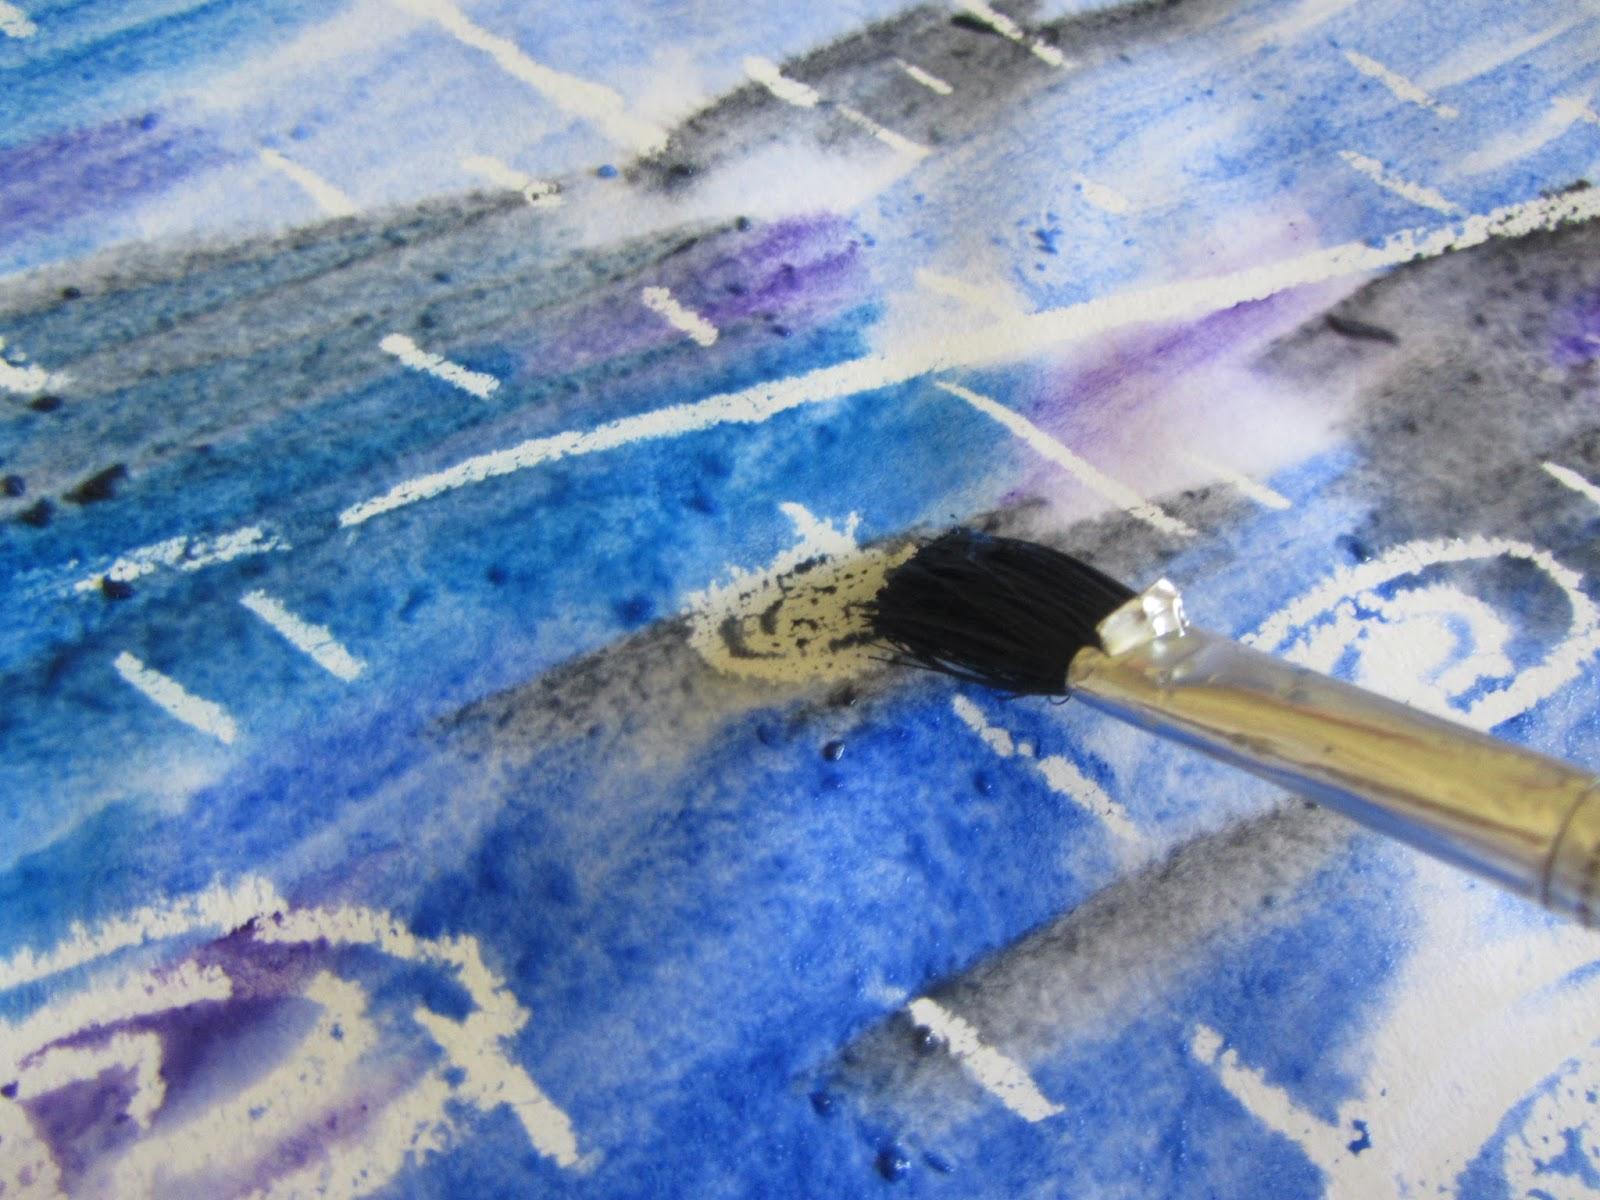 Rainy Day Wax Resist Easy peasy art tutorial